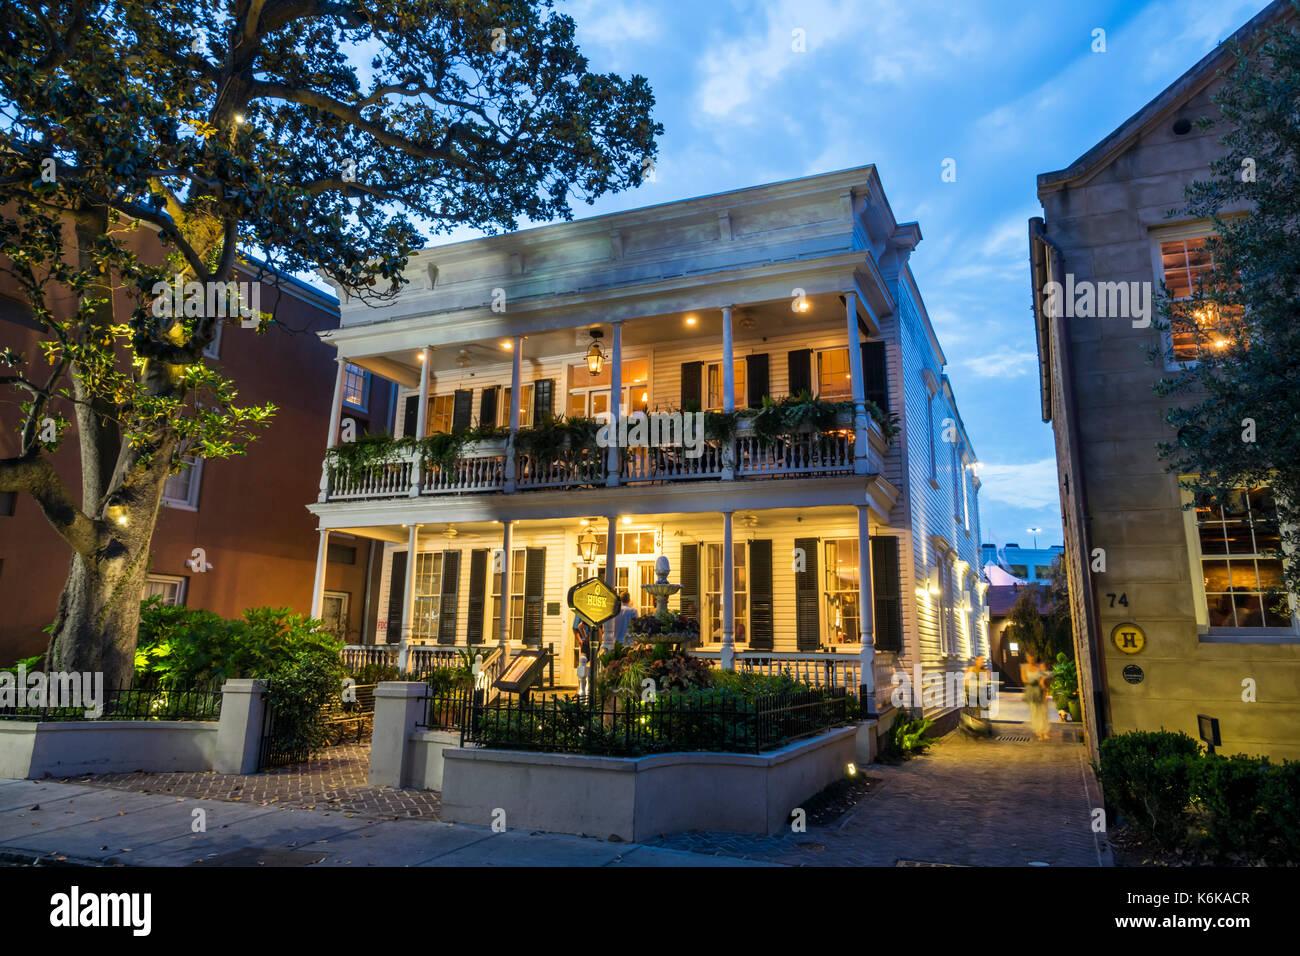 Charleston Sc Dining Imágenes De Stock & Charleston Sc Dining Fotos ...